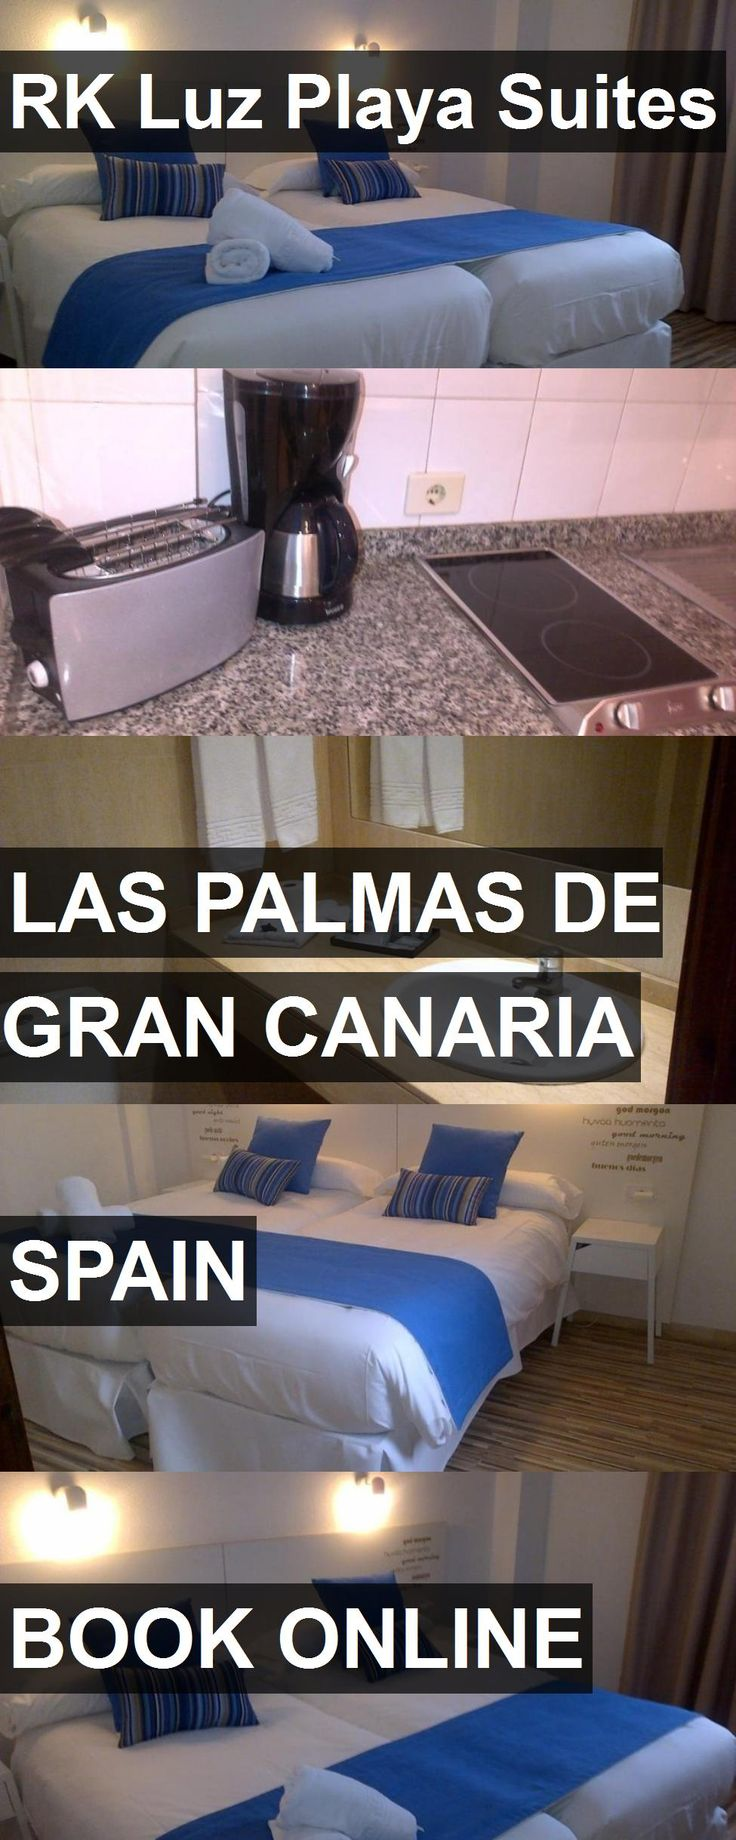 Hotel RK Luz Playa Suites in Las Palmas de Gran Canaria, Spain. For more information, photos, reviews and best prices please follow the link. #Spain #LasPalmasdeGranCanaria #travel #vacation #hotel